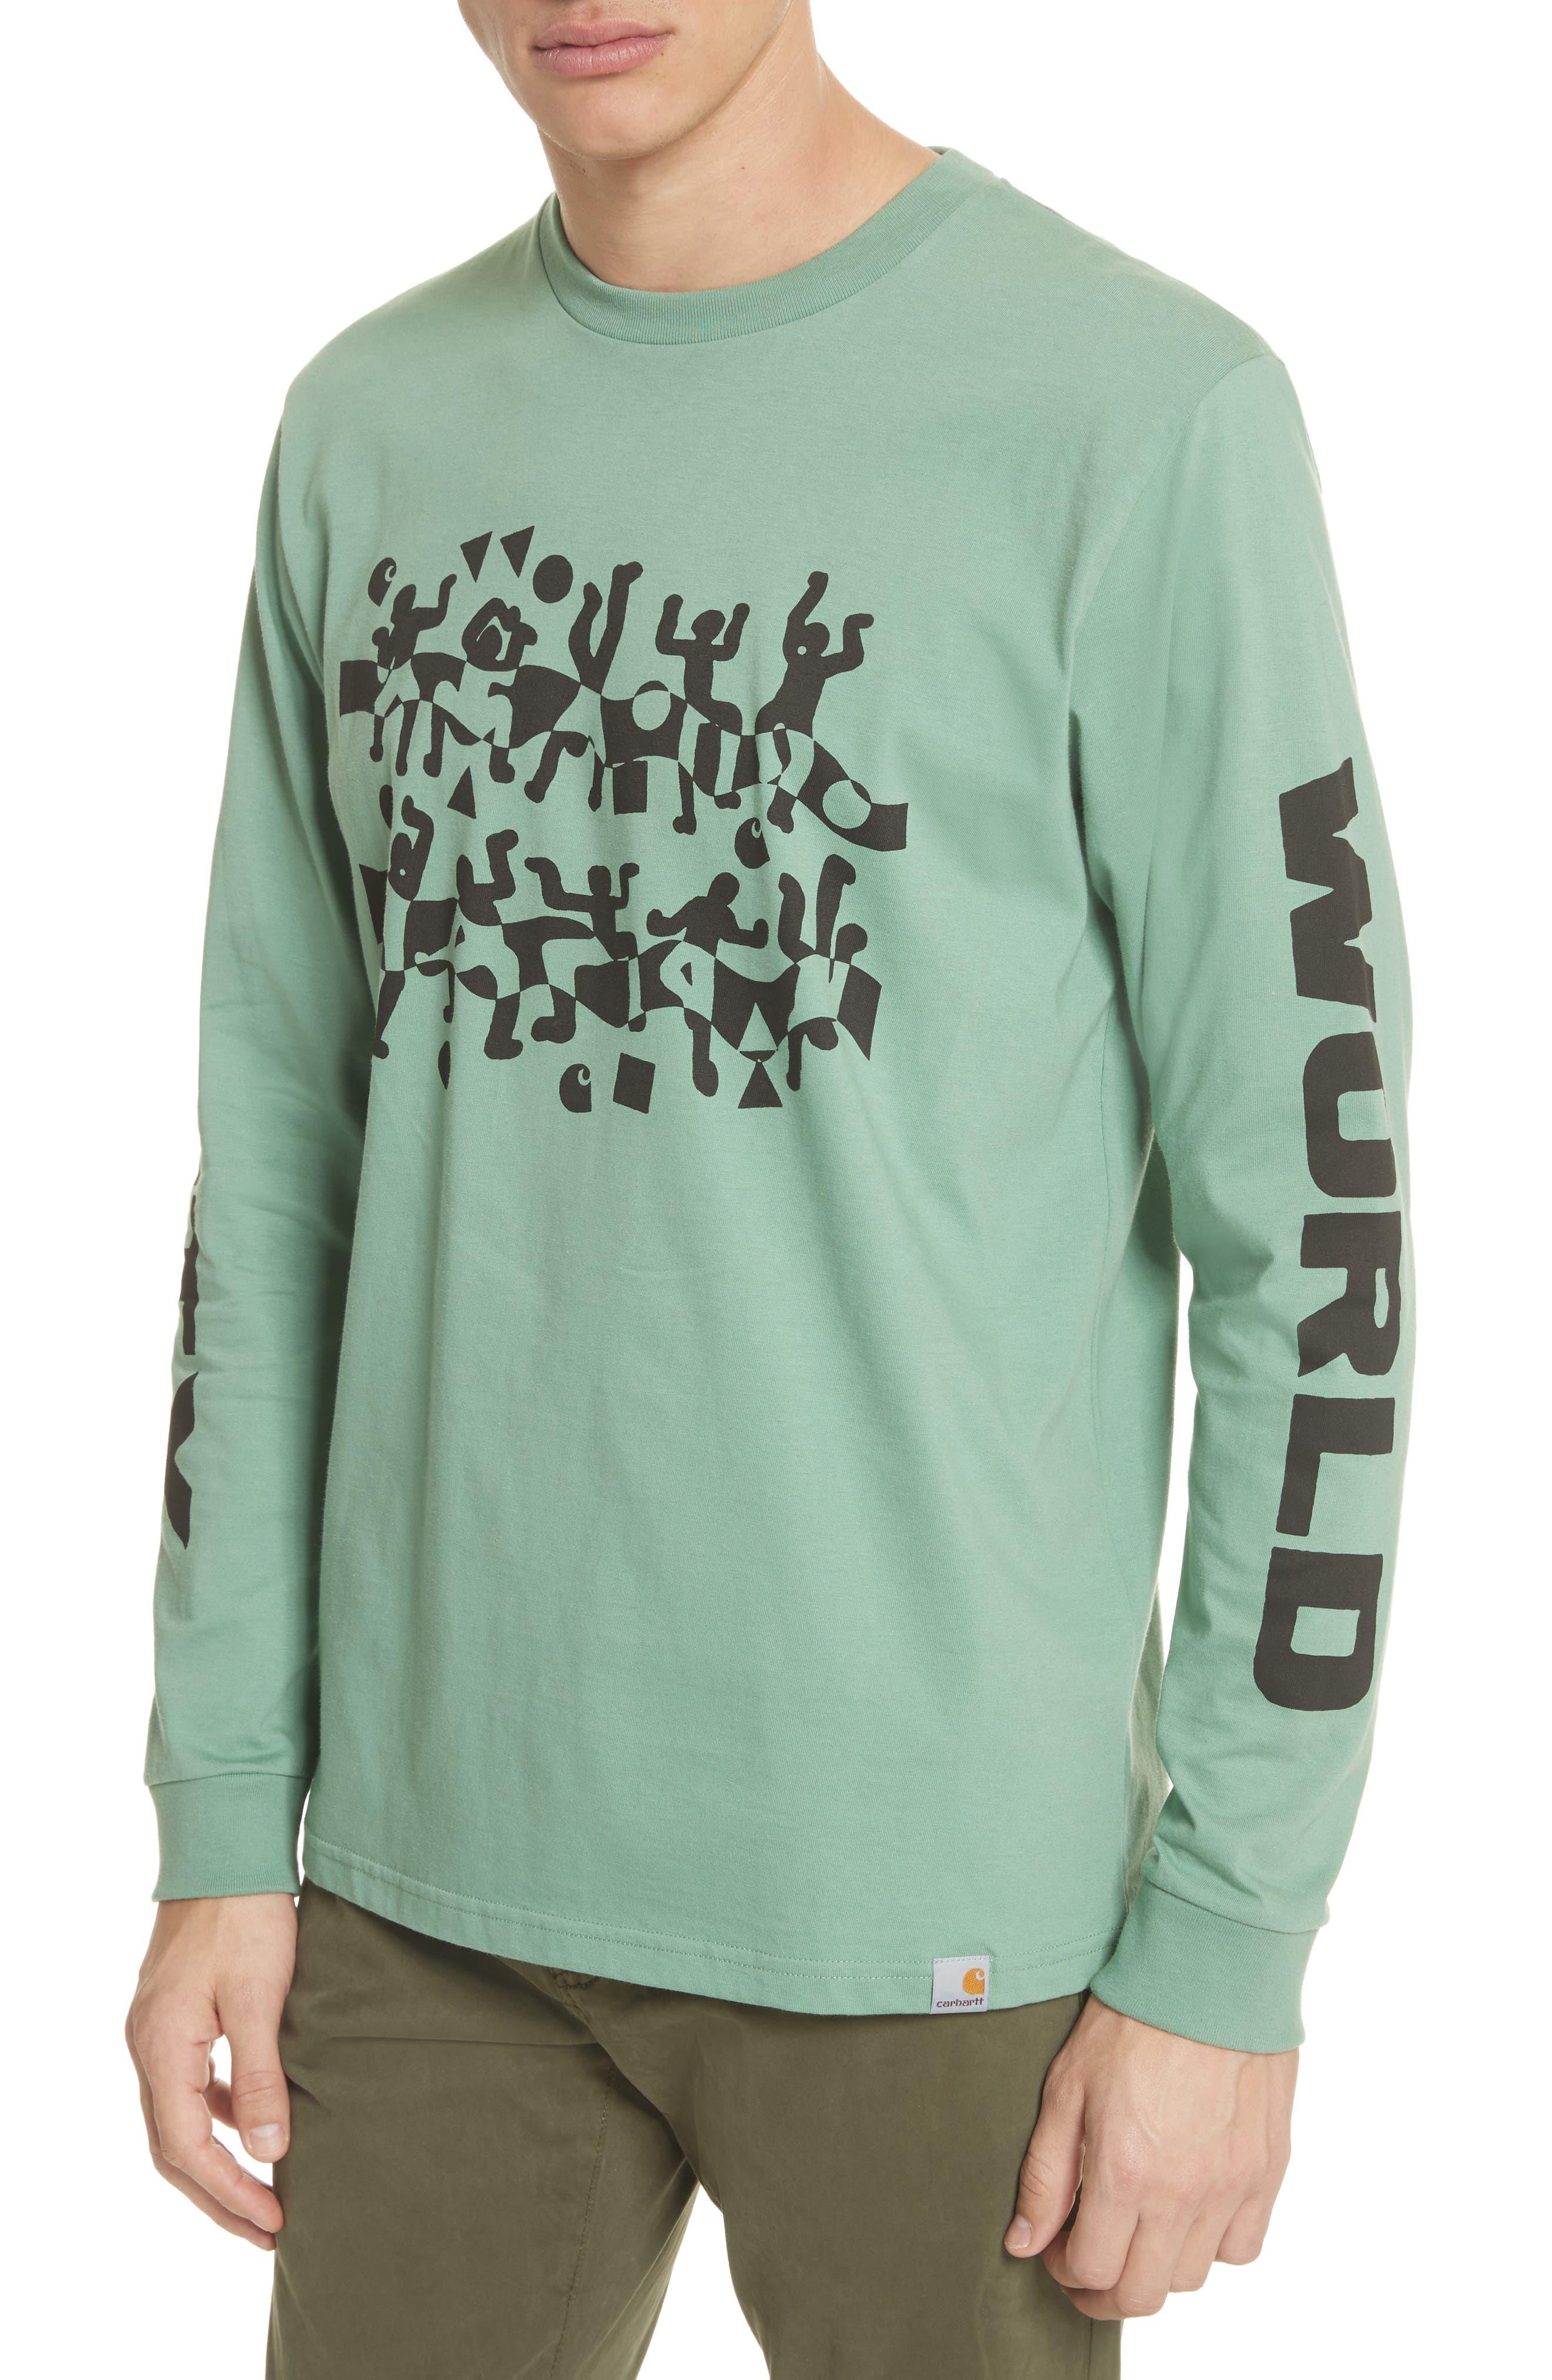 World Party T-Shirt,                             Alternate thumbnail 4, color,                             Catnip/Black